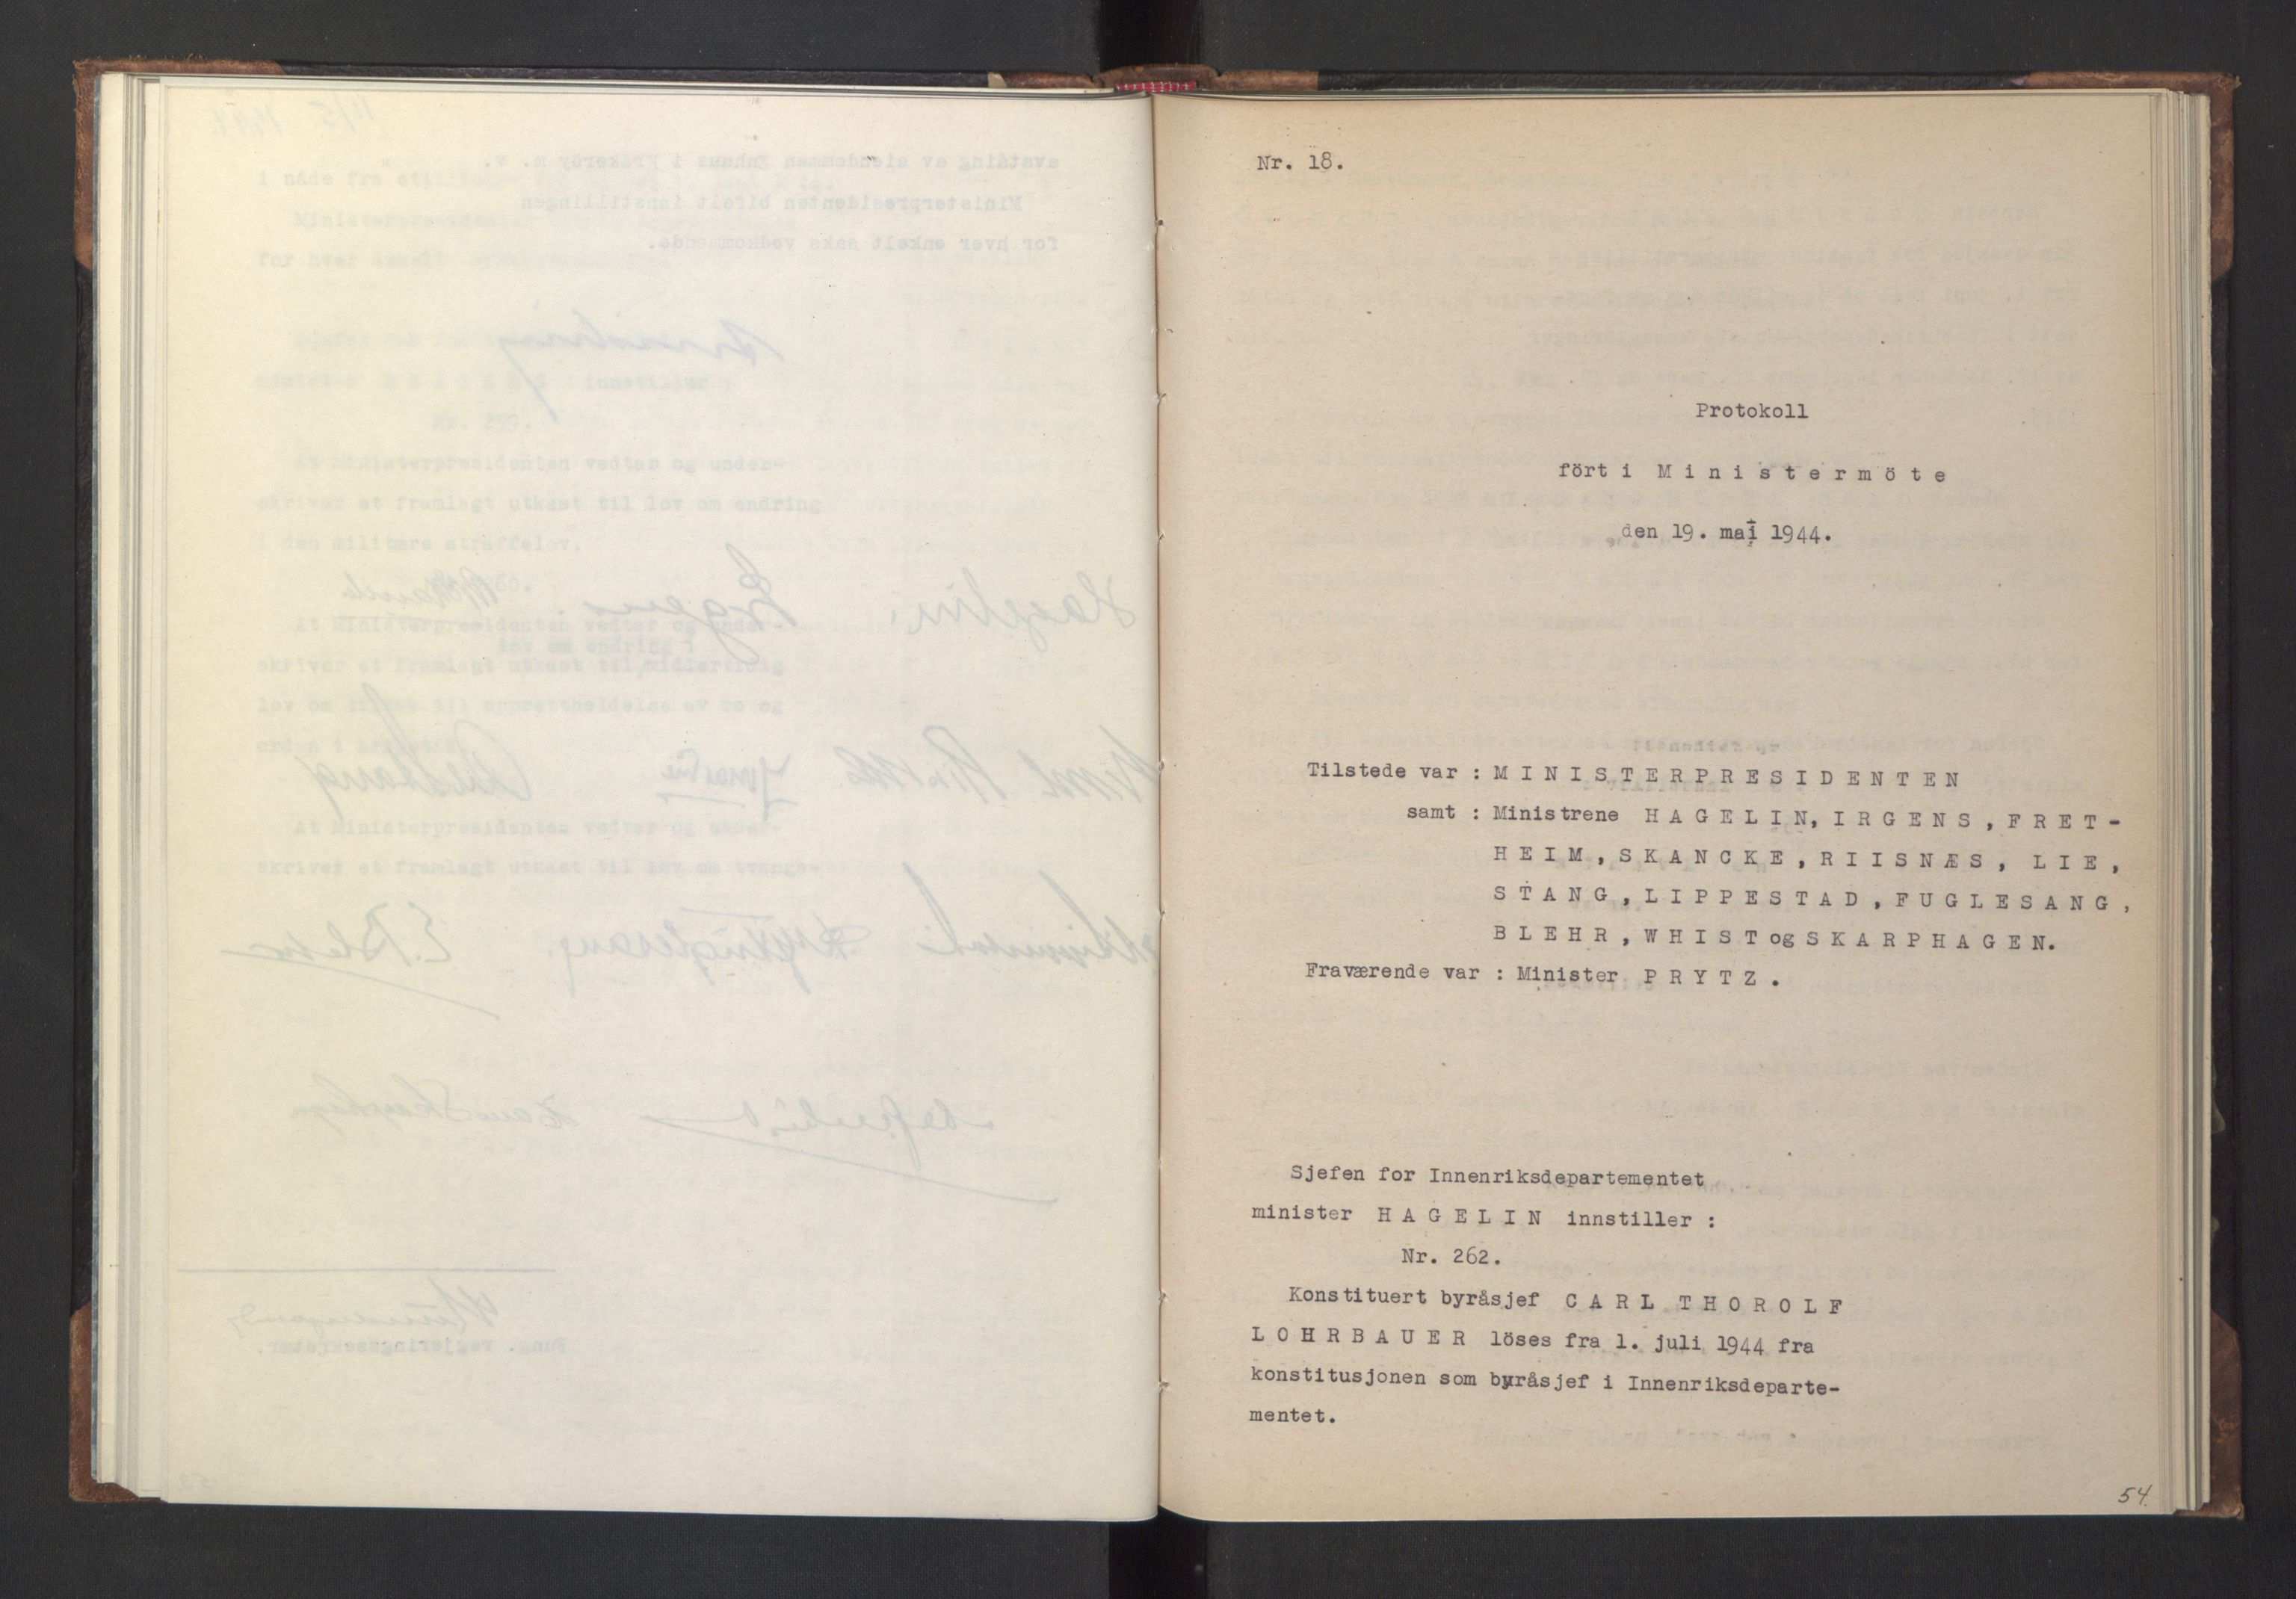 RA, NS-administrasjonen 1940-1945 (Statsrådsekretariatet, de kommisariske statsråder mm), D/Da/L0005: Protokoll fra ministermøter, 1944, s. 53b-54a